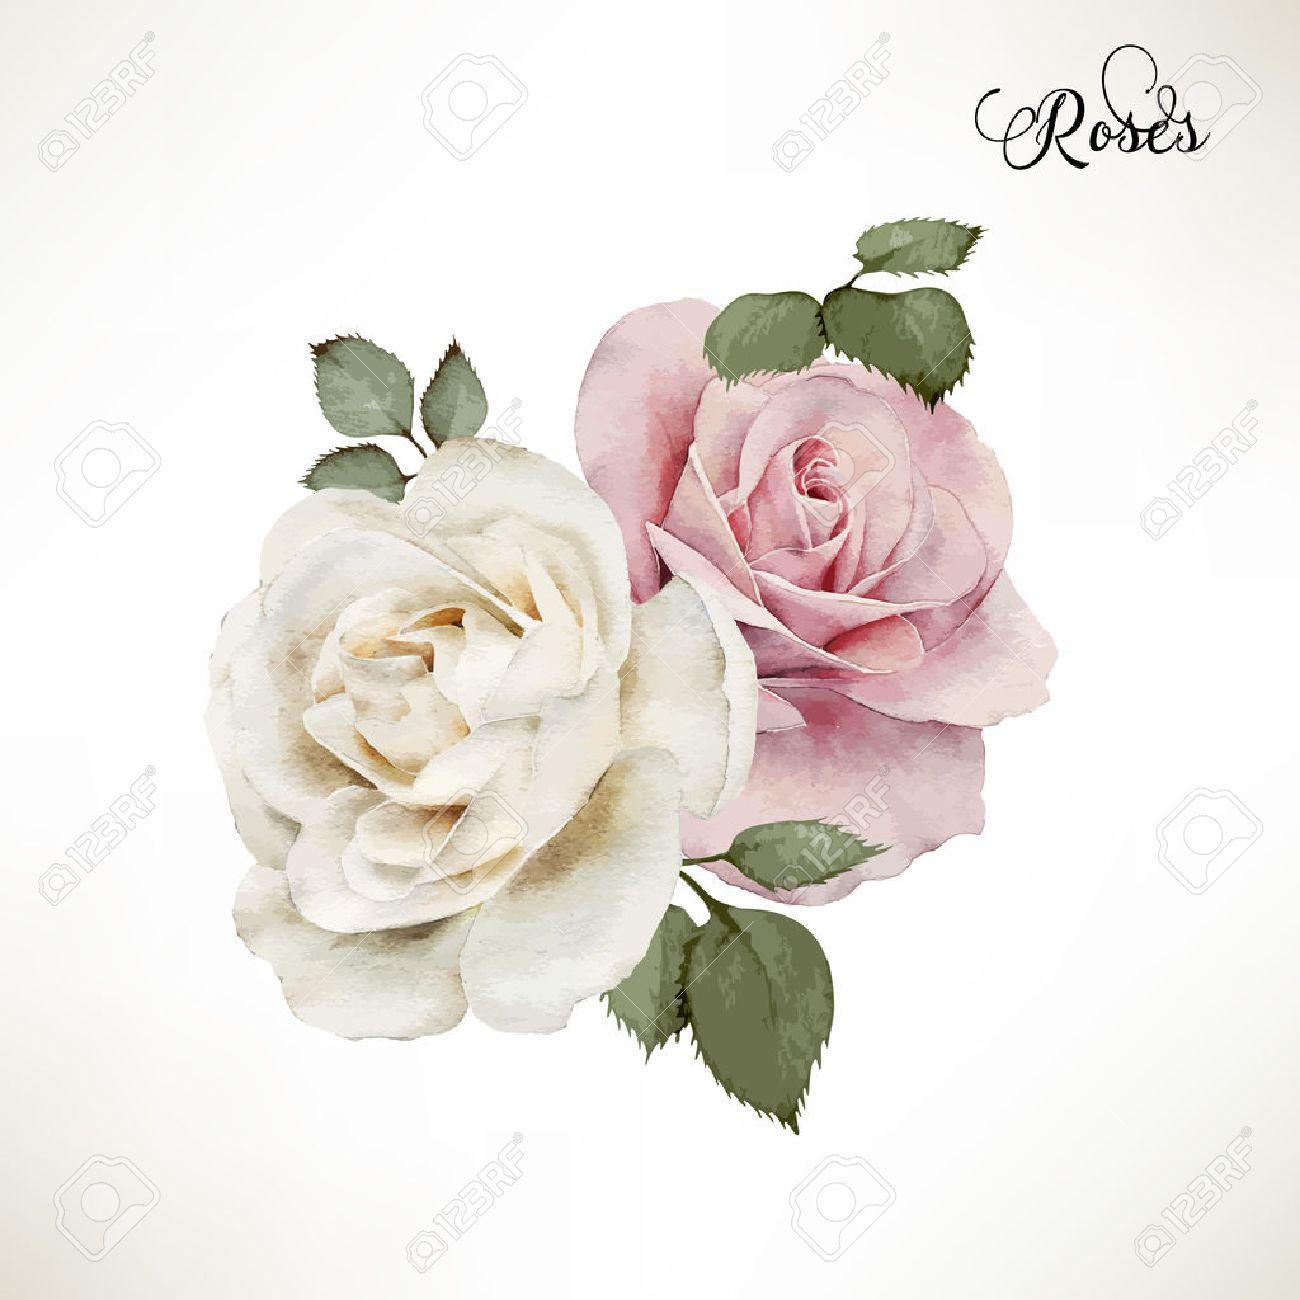 Blumenstrauss Aus Rosen Aquarell Kann Als Grusskarte